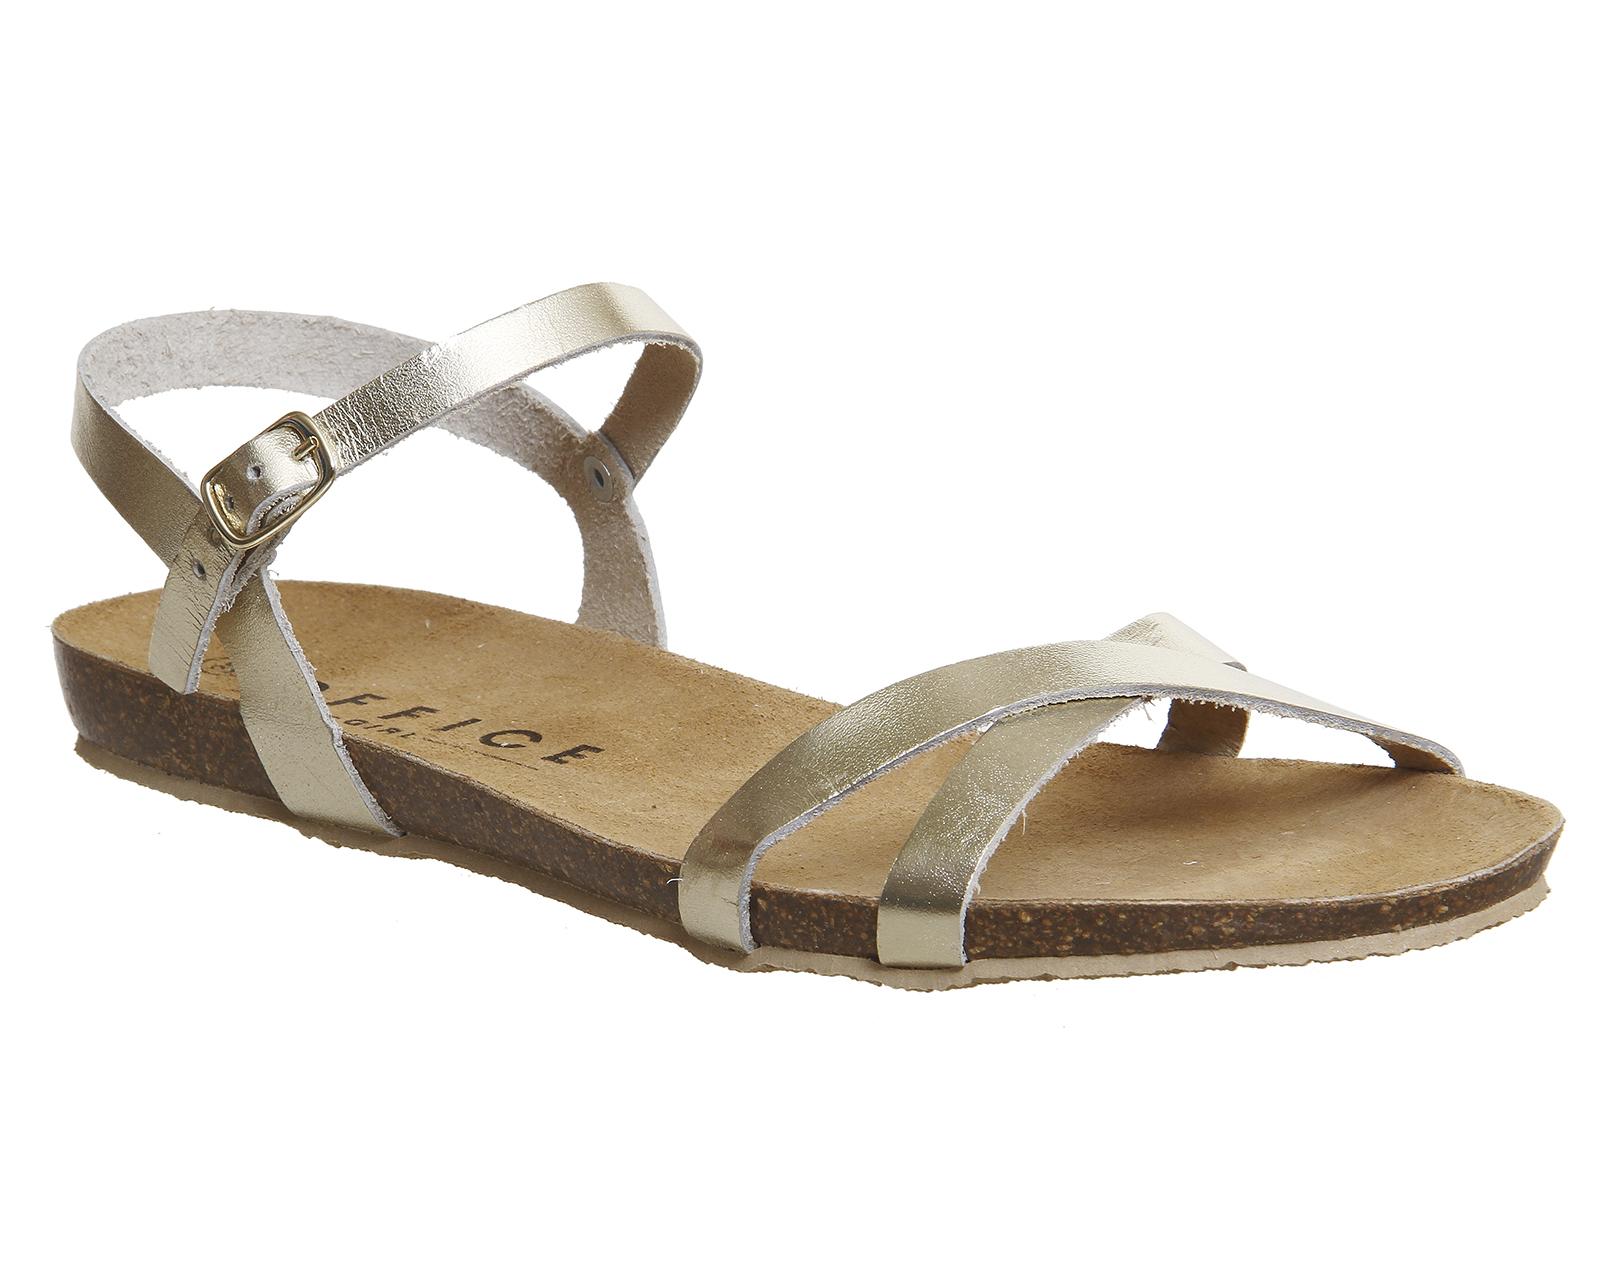 Womens-Office-Safari-Cross-Strap-Sandals-GOLD-LEATHER-